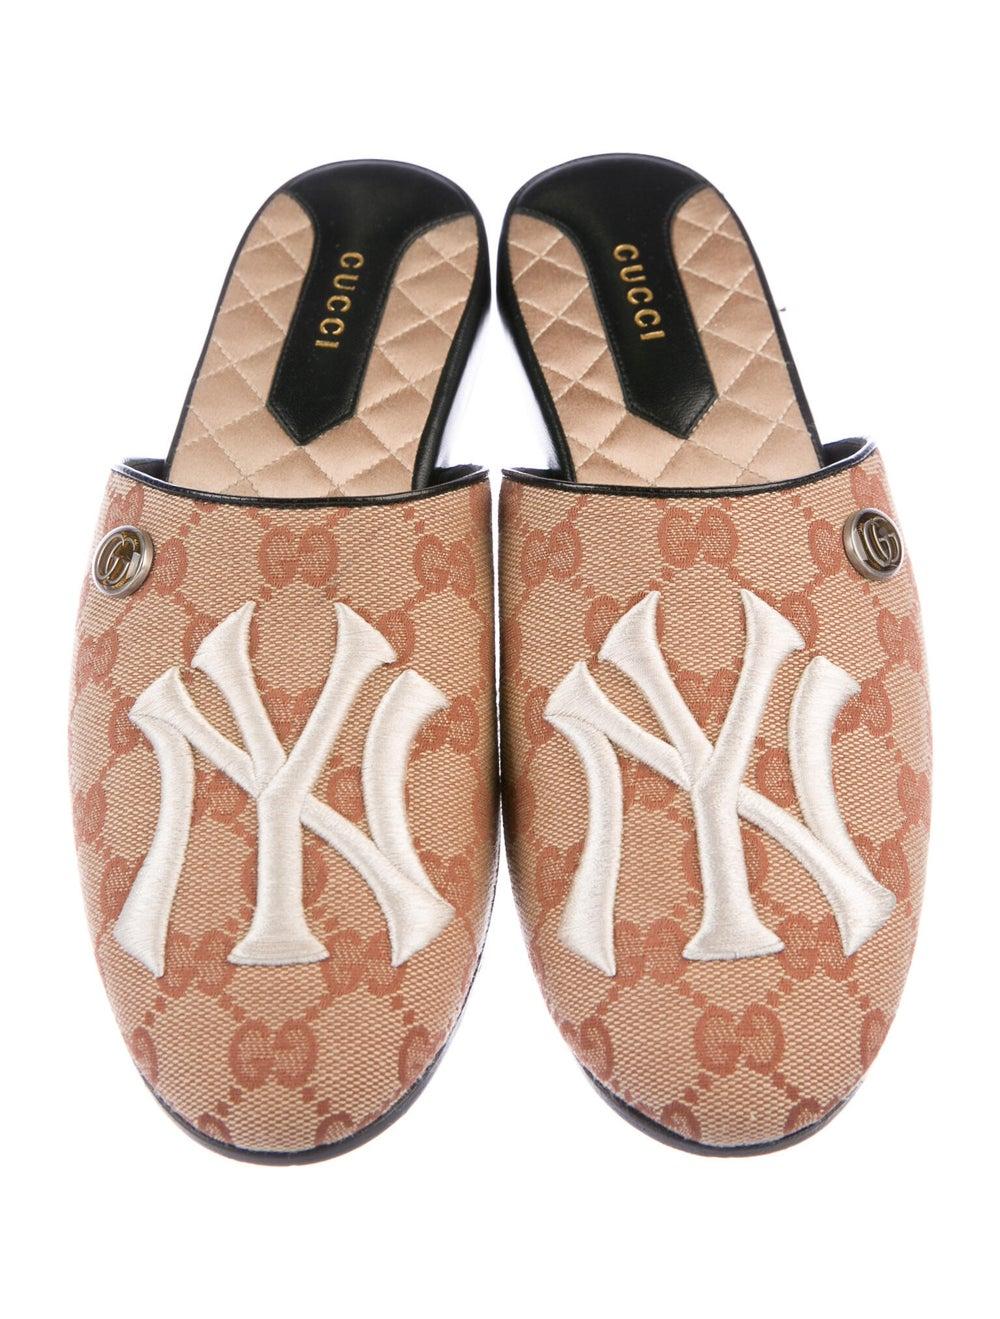 Gucci NY Yankees GG Canvas Mules - image 3